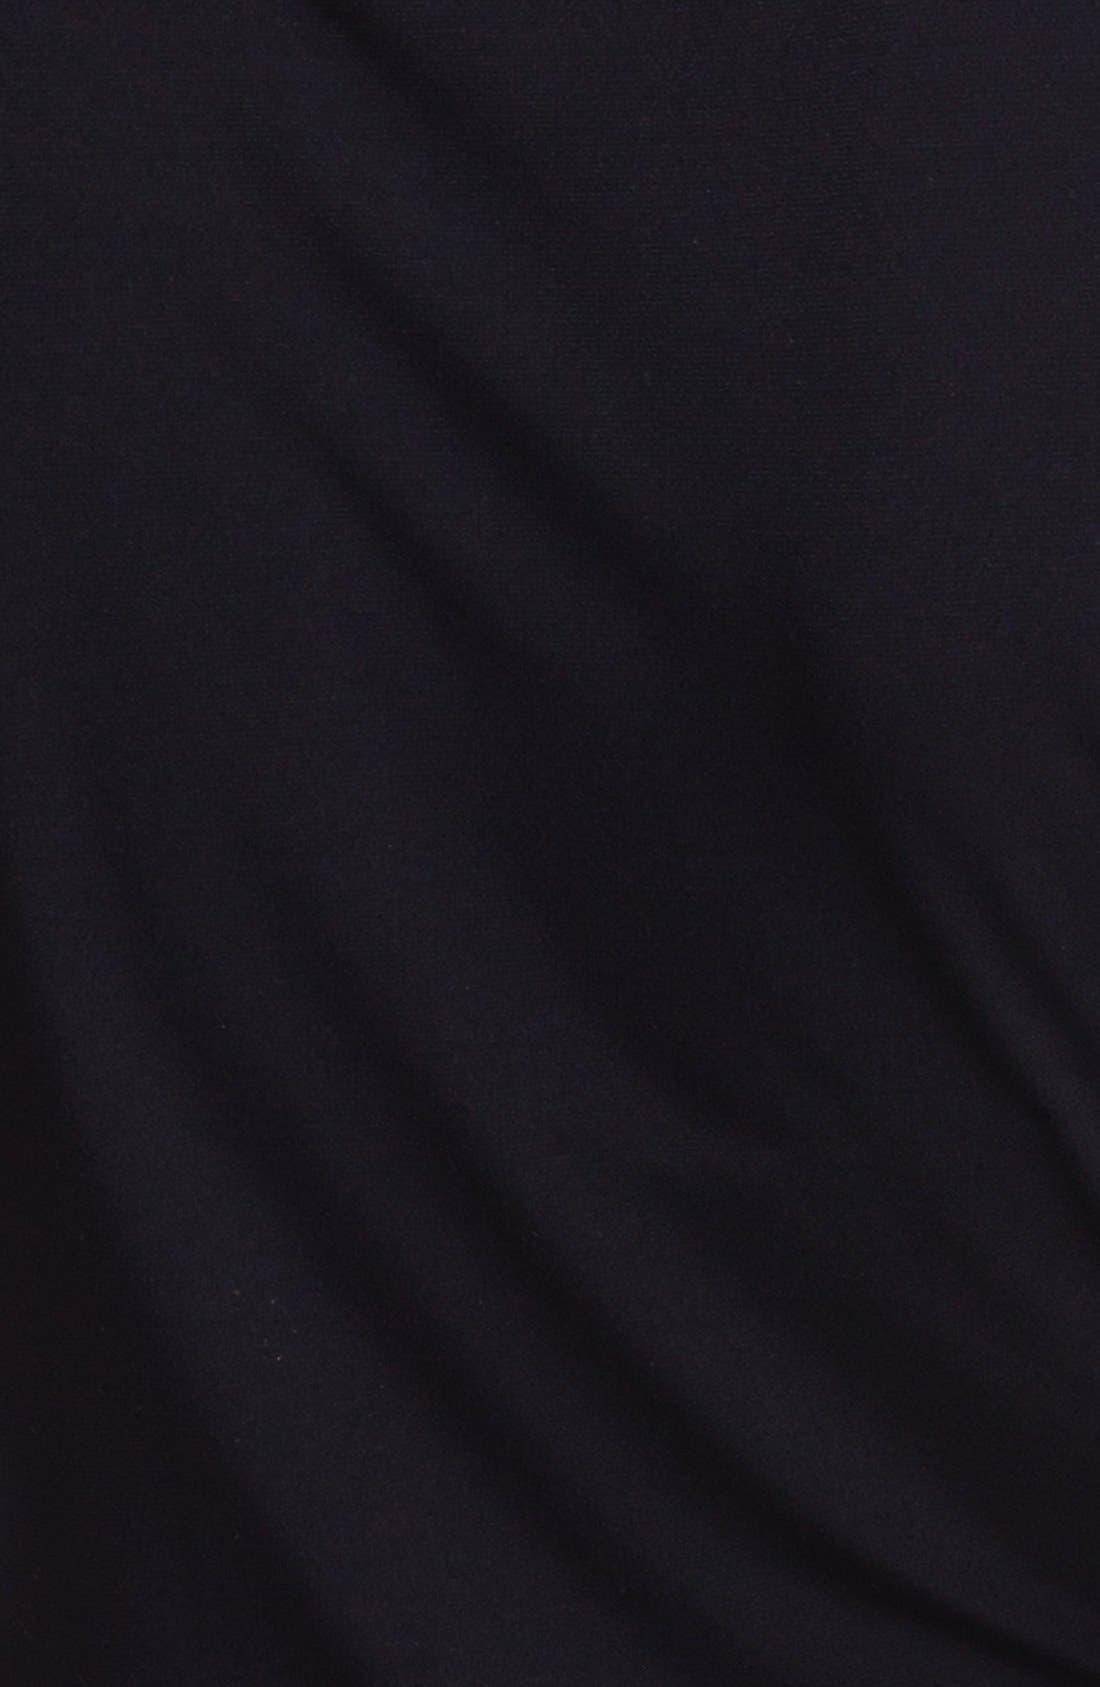 Alternate Image 3  - MICHAEL Michael Kors Studded Matte Jersey Top (Petite)